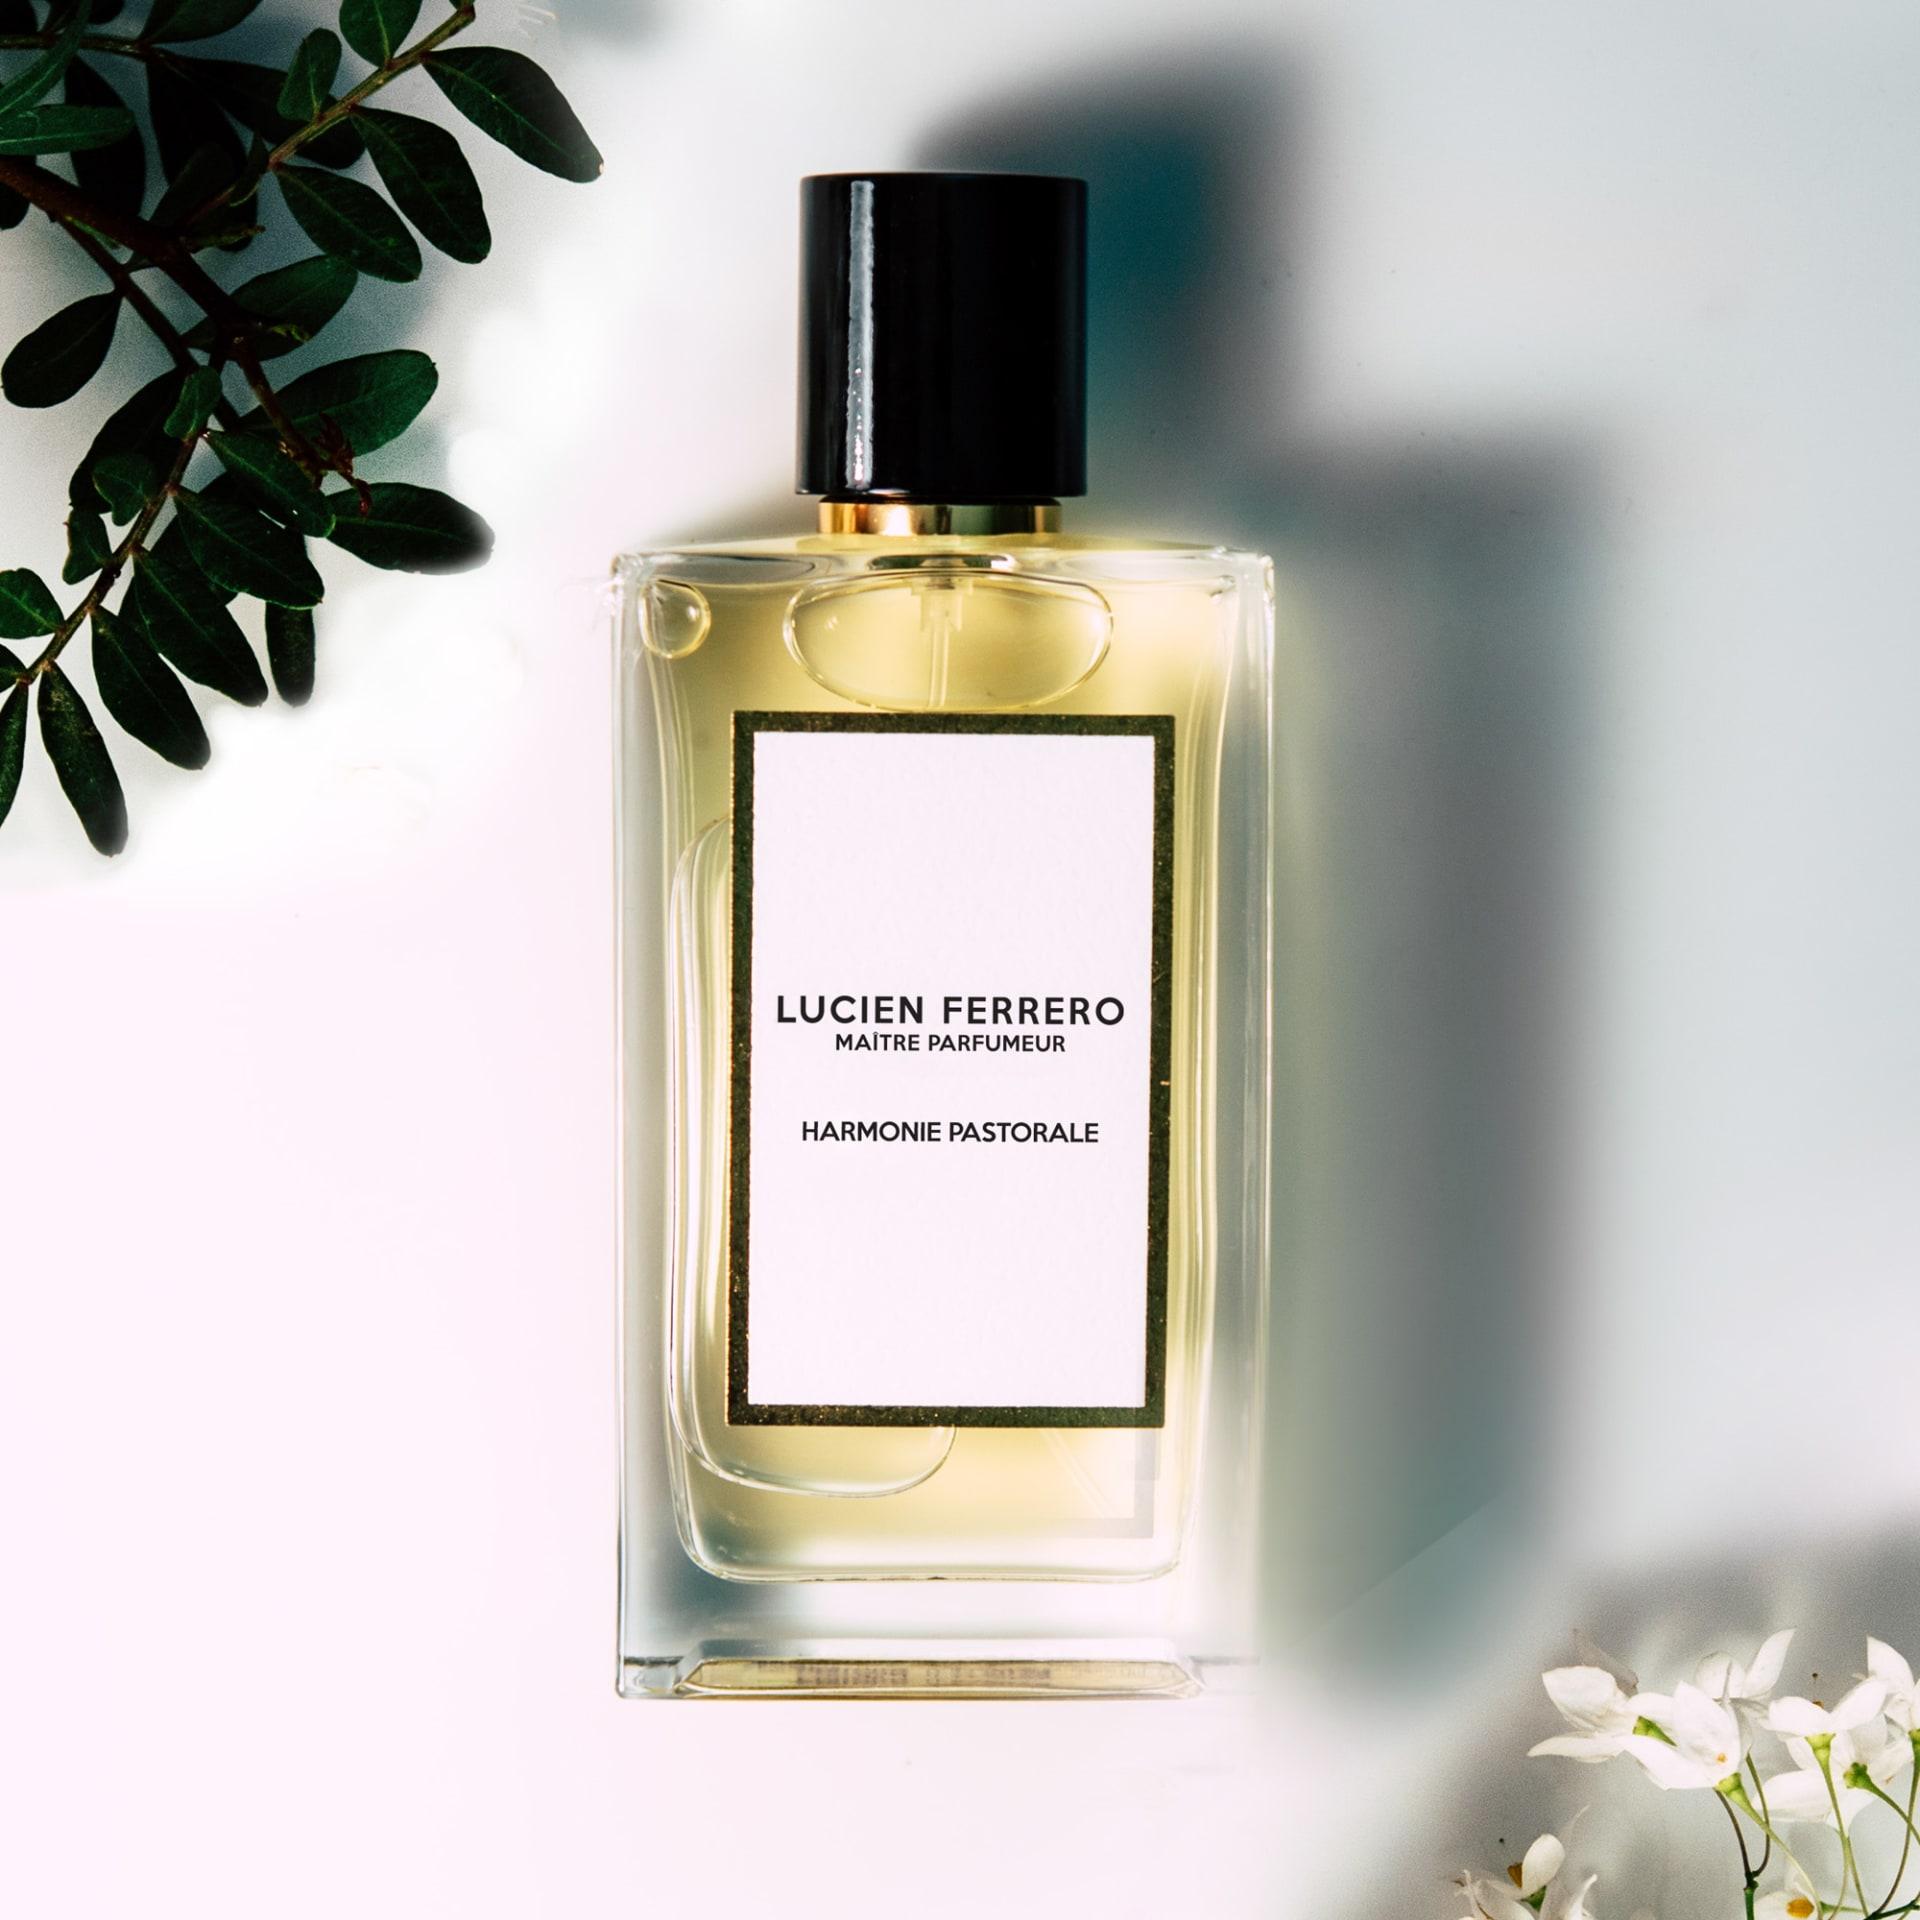 lucien-ferrero-maitre-parfumeur-harmonie-pastorale